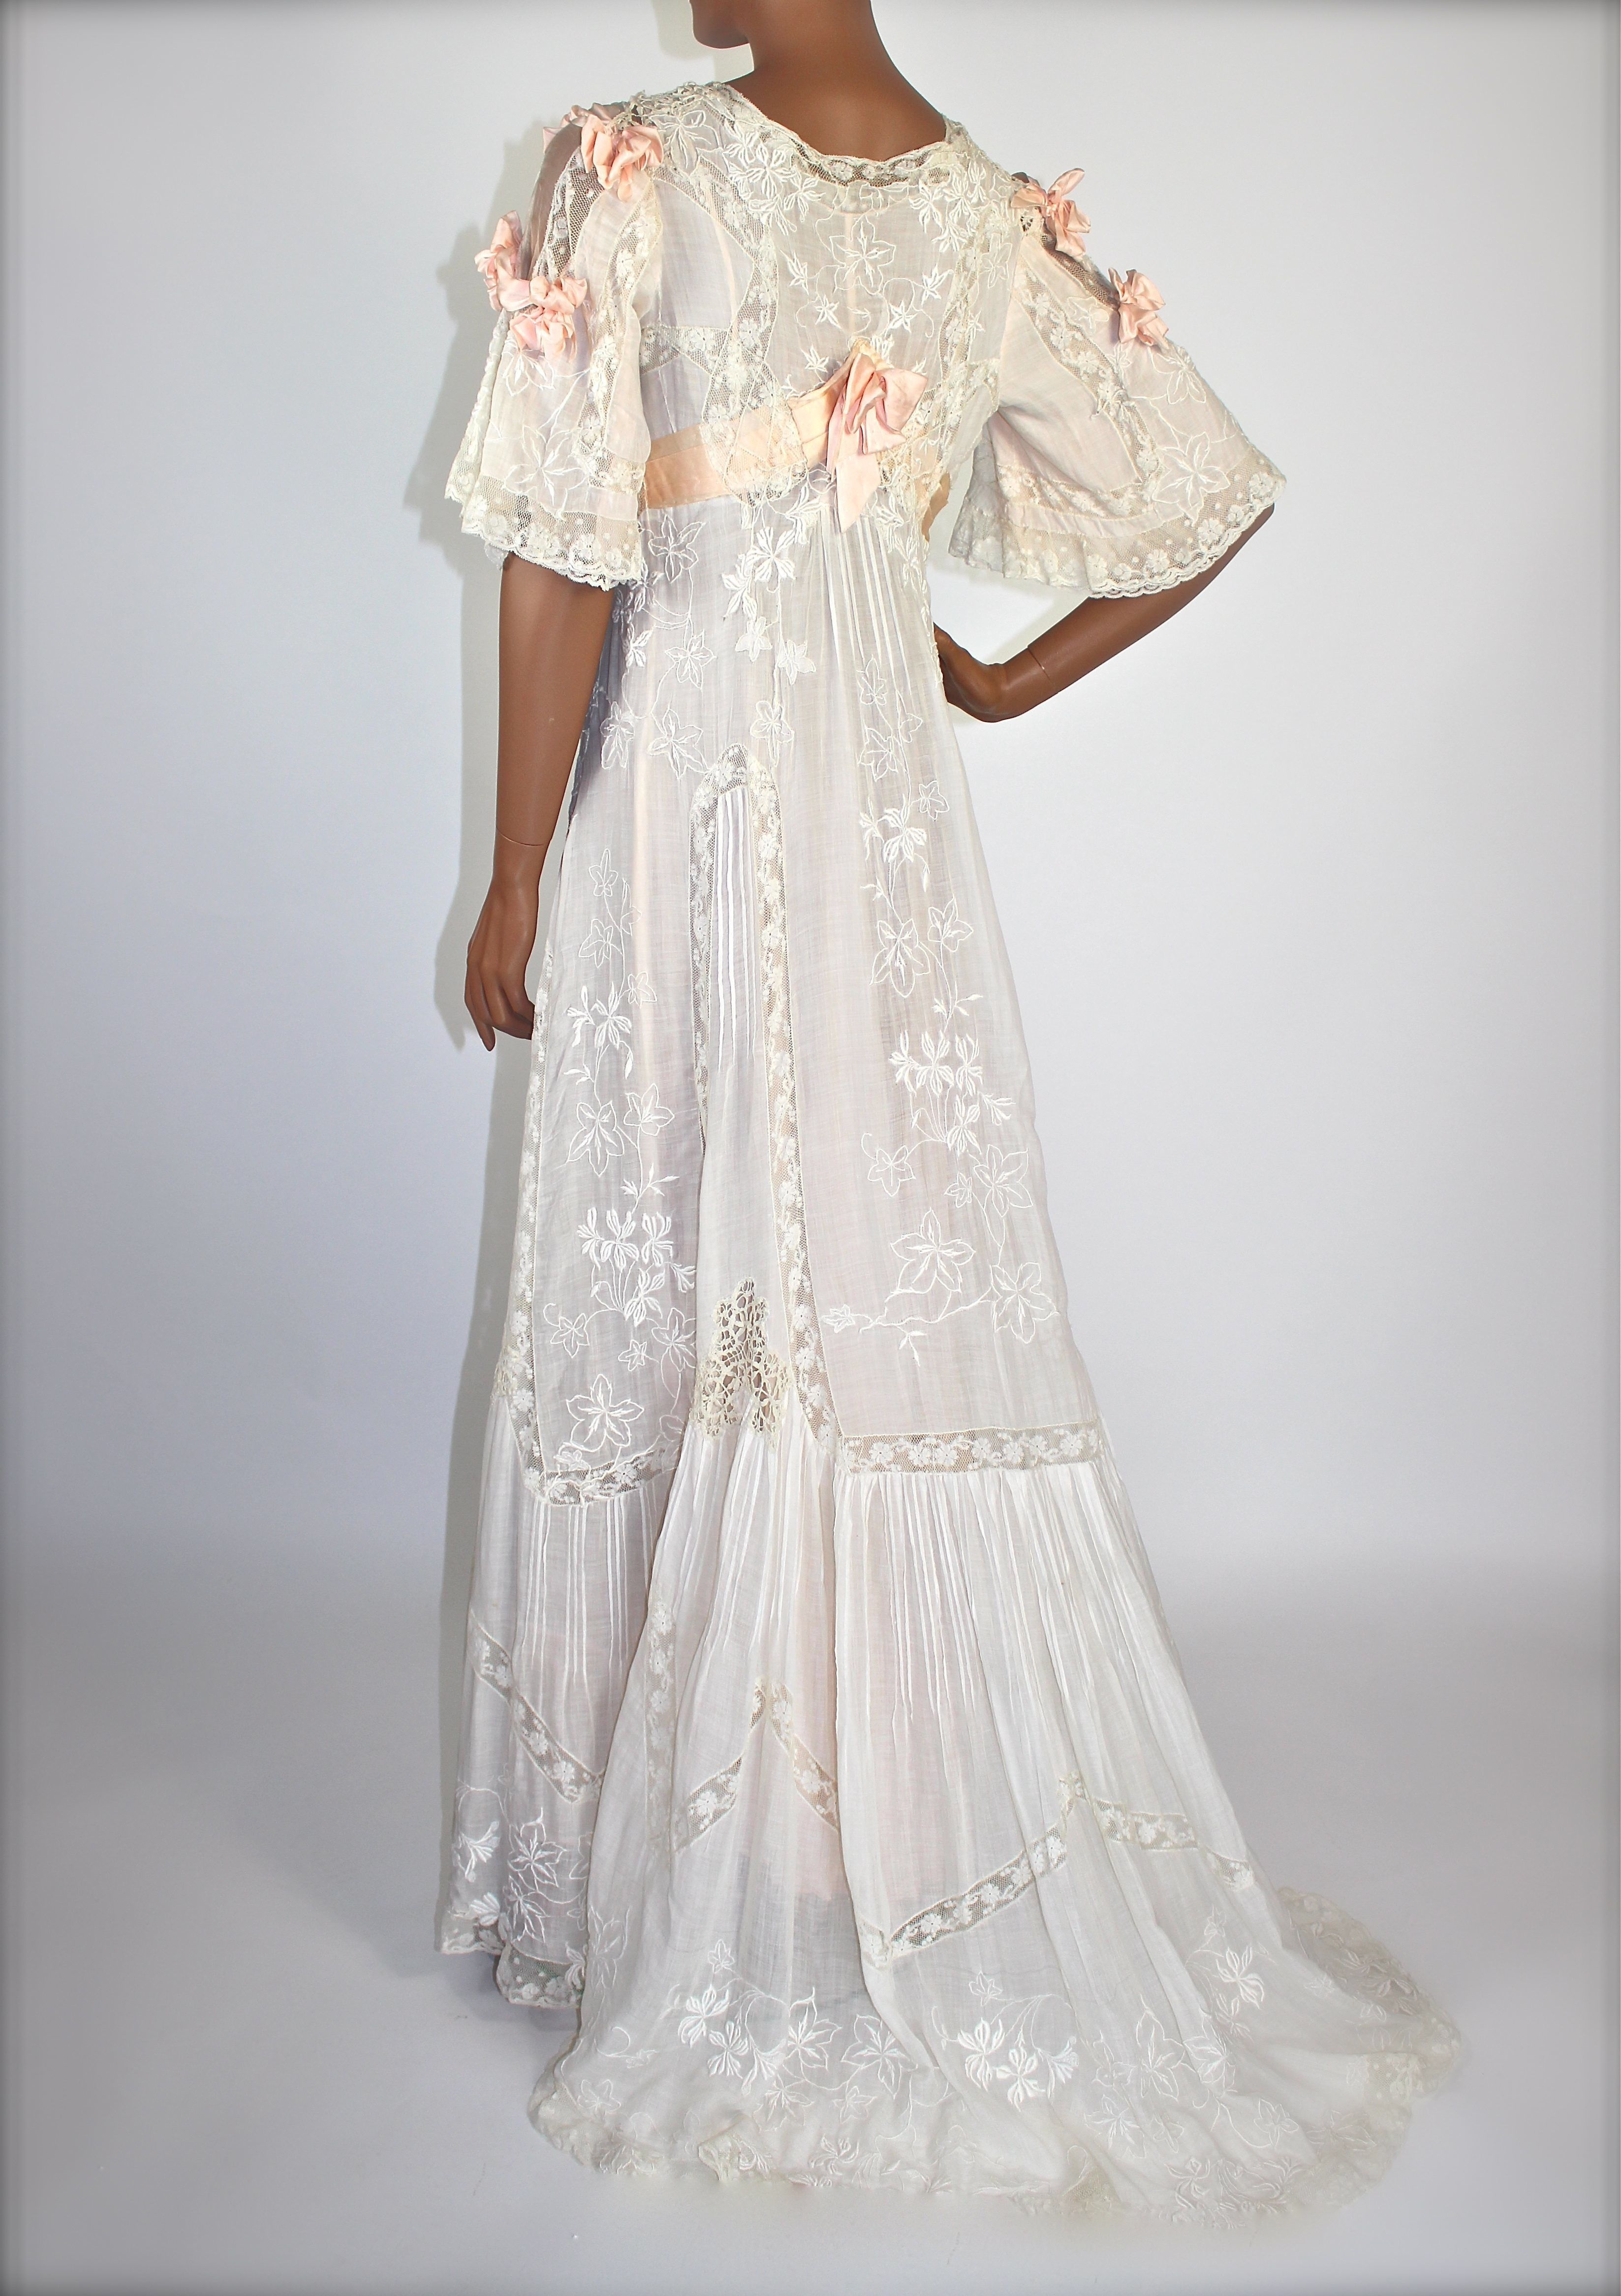 edwardian cotton batiste u mixed lace wedding gown c